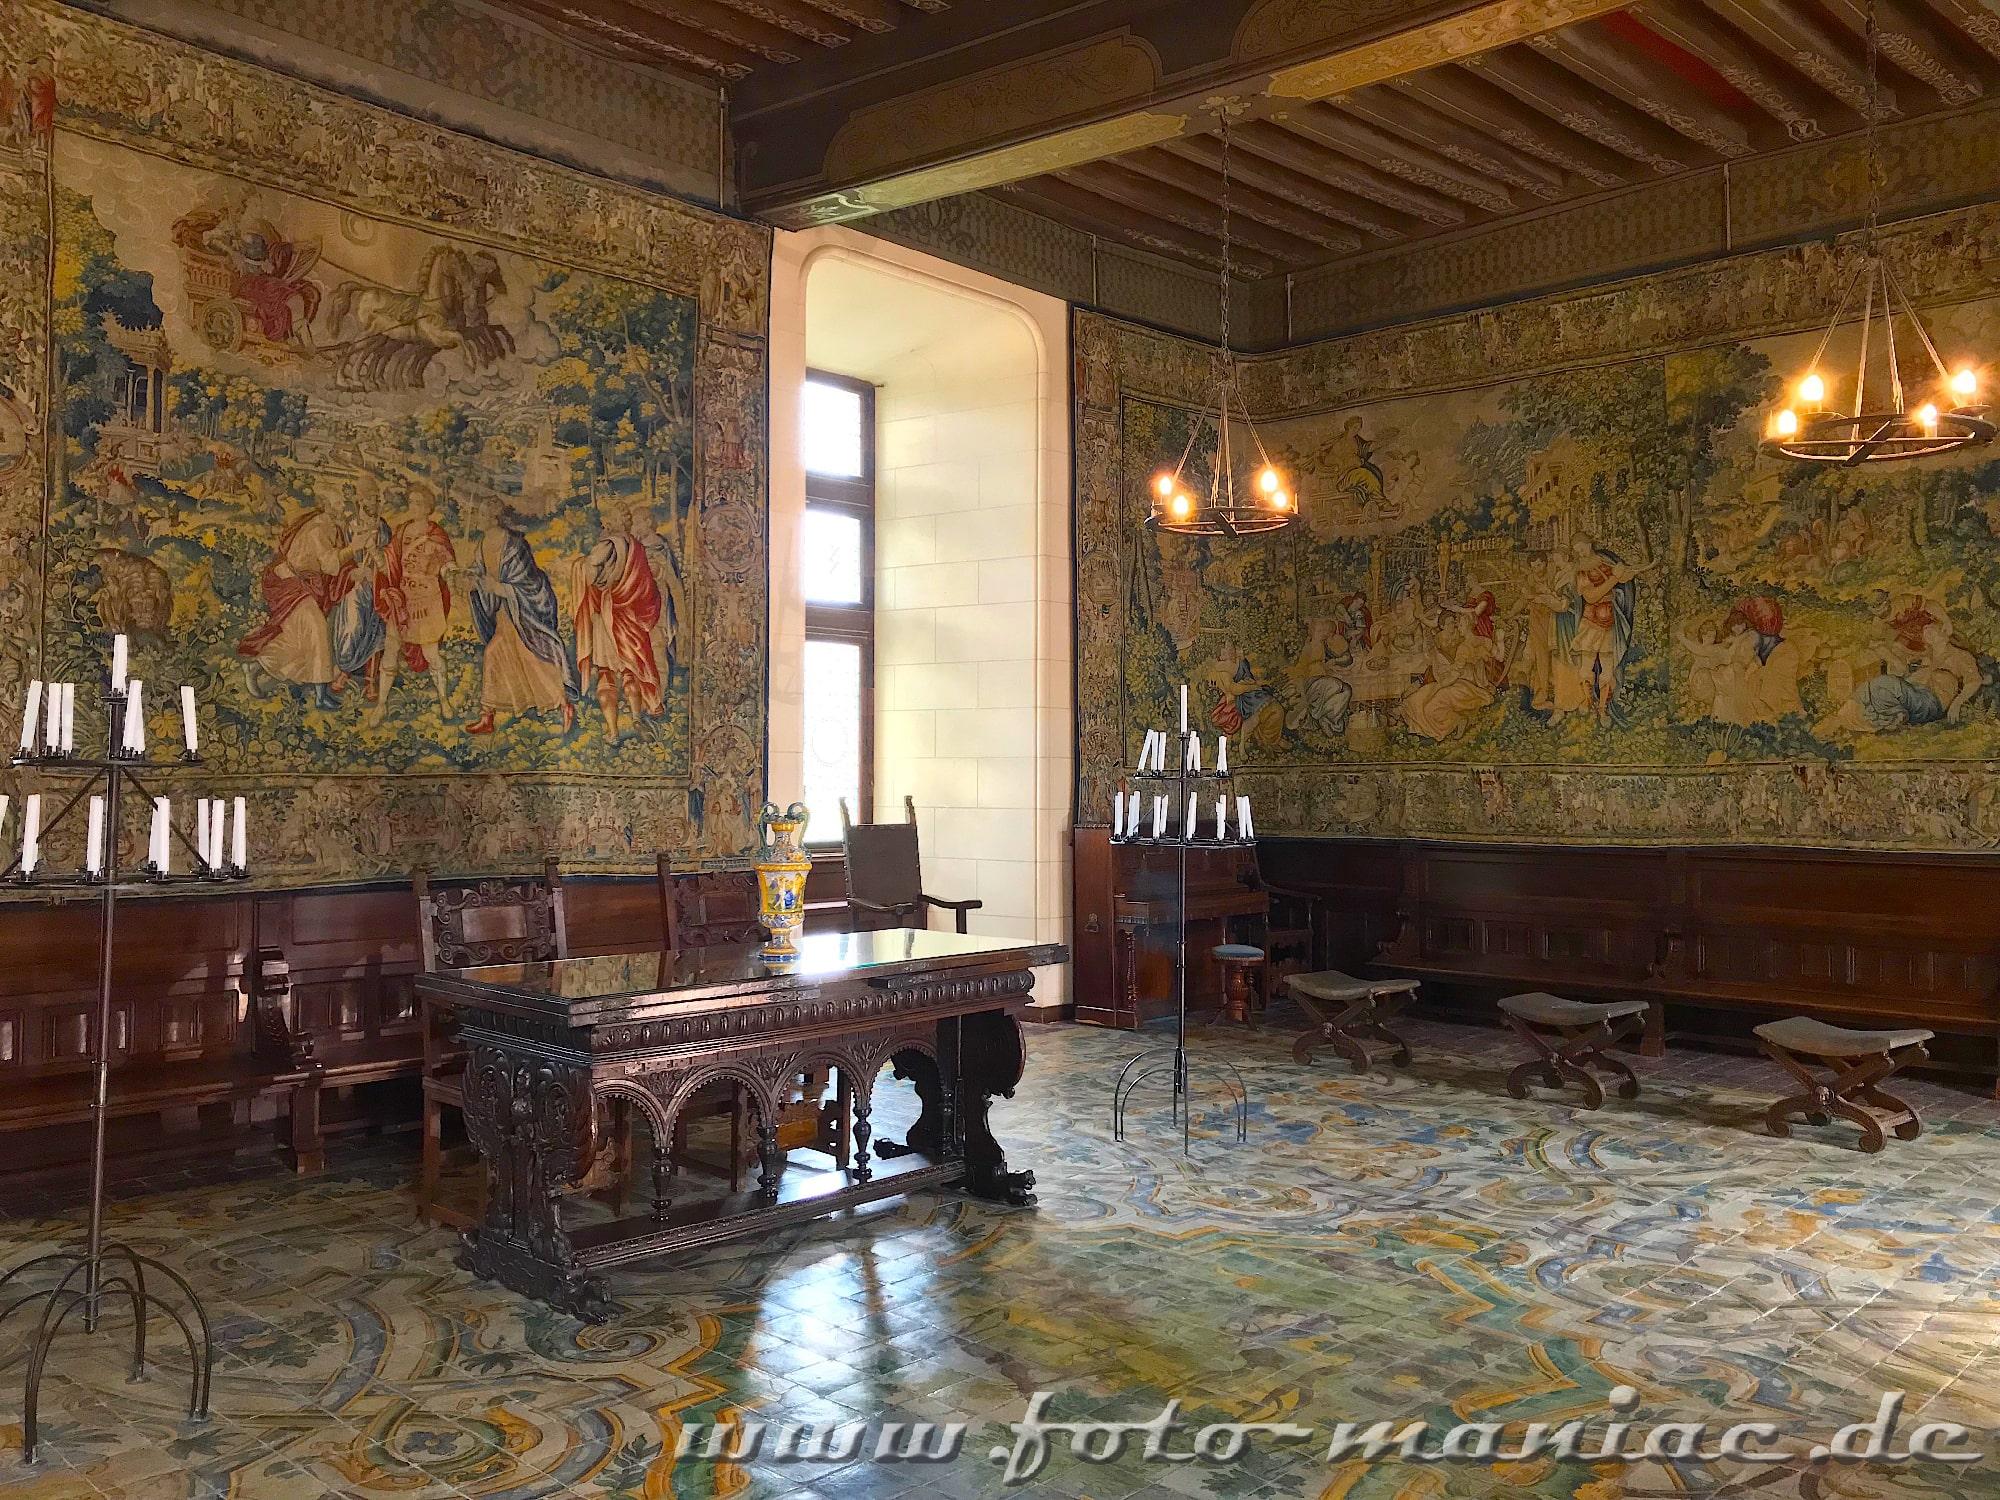 Dim Rittersaal hängen kostbare Wandteppiche